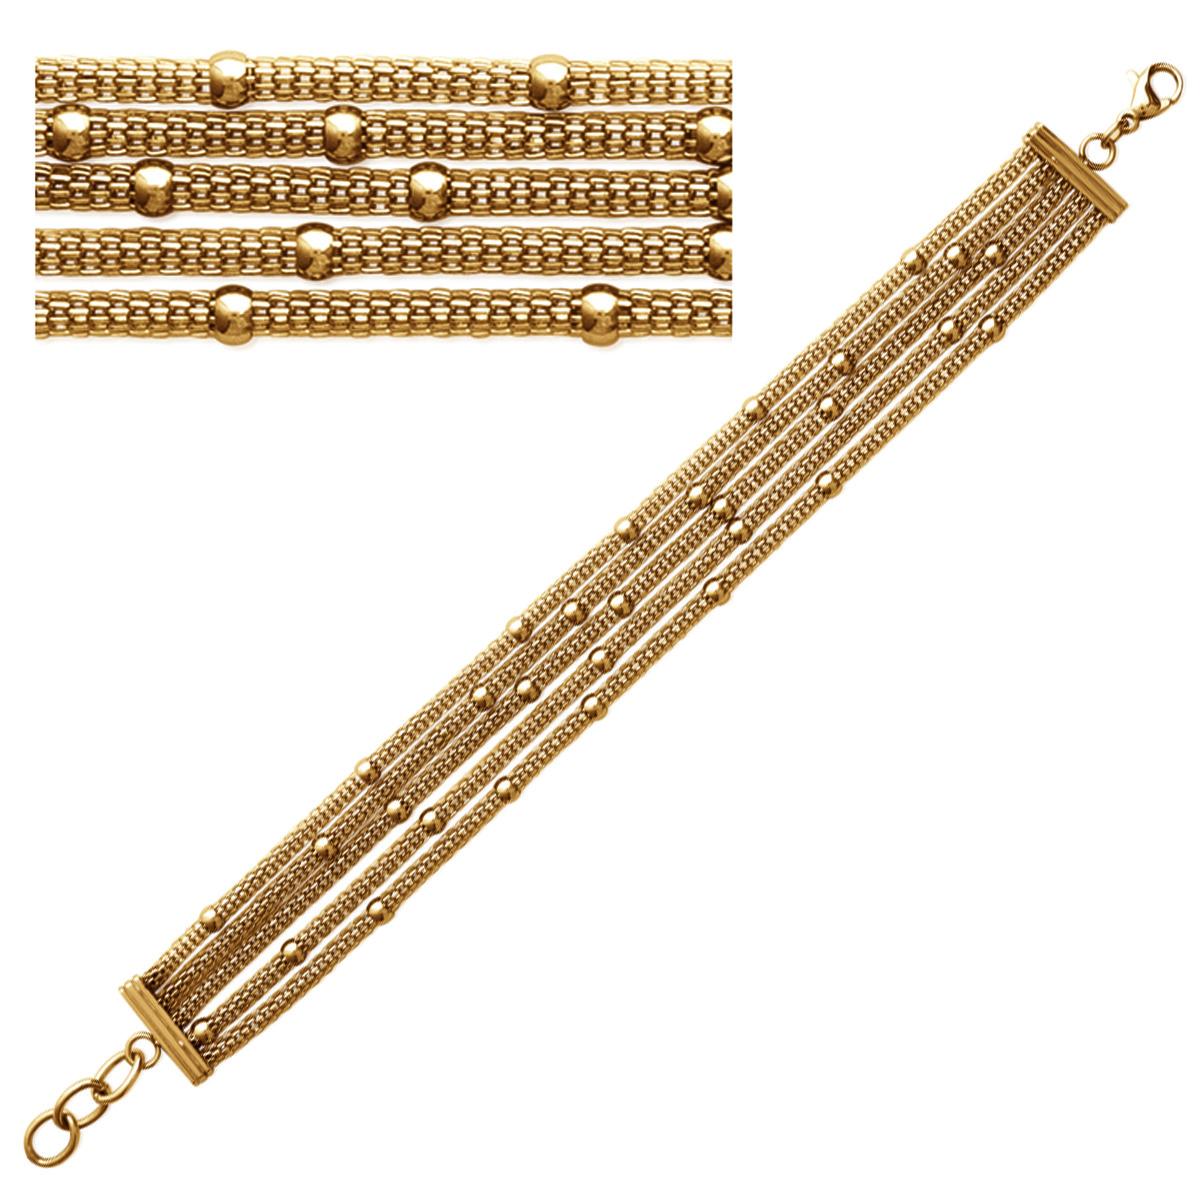 Bracelet Acier \'Kilimanjaro\' doré (5 rangs) - 15 mm - [N3029]